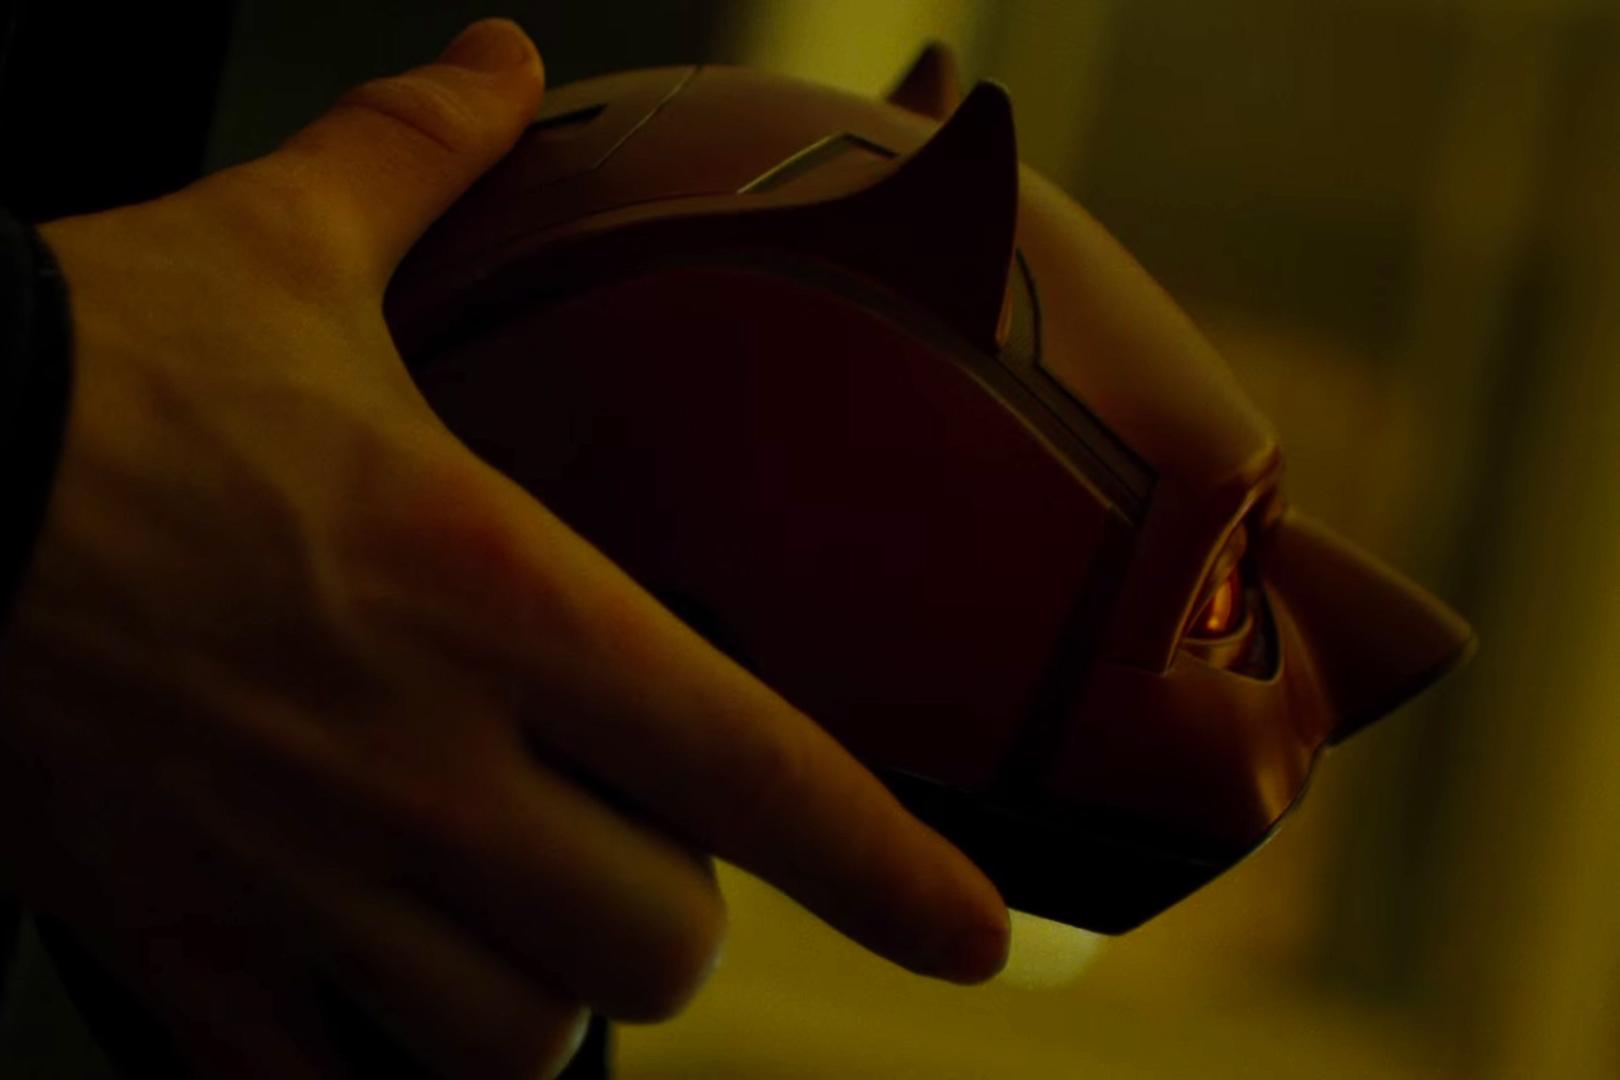 'Daredevil' Season 2: Part 2 Trailer Welcomes Elektra